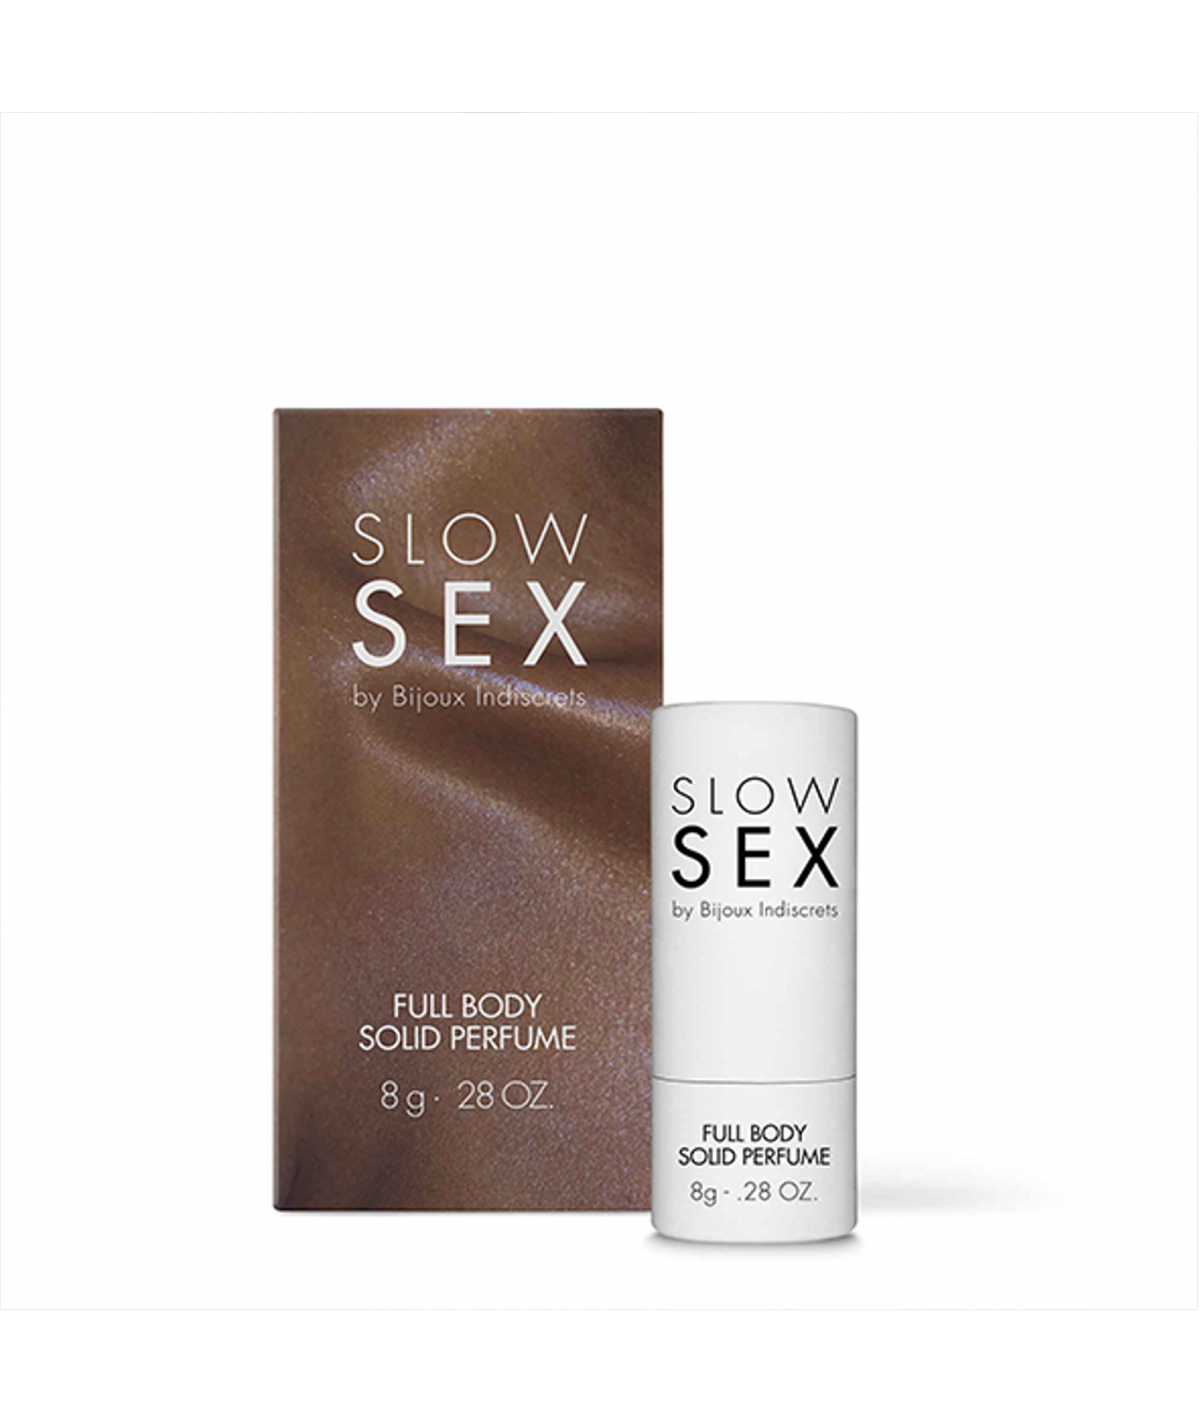 Slow Sex Body Parfum